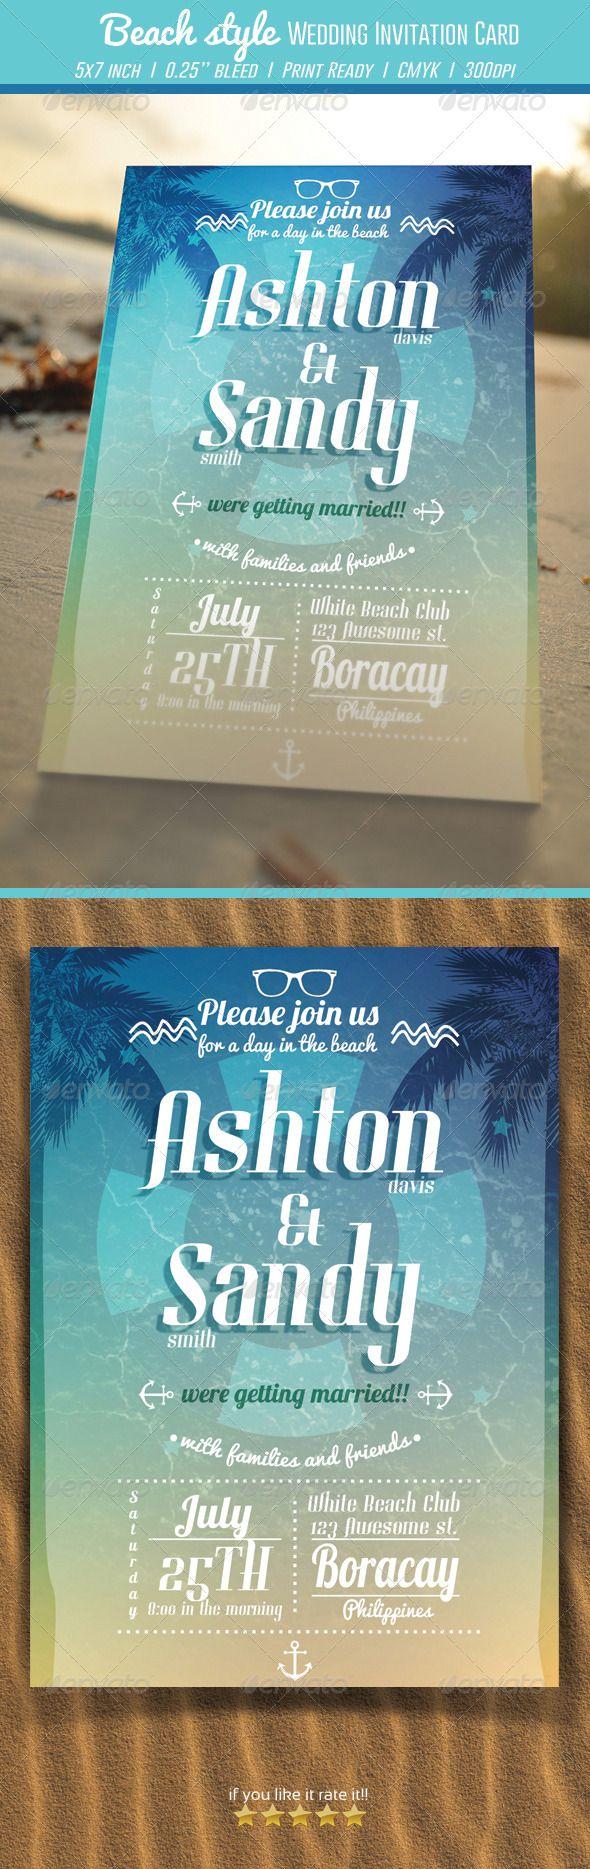 beach wedding invitation samples%0A Beach Style Wedding Invitation Card